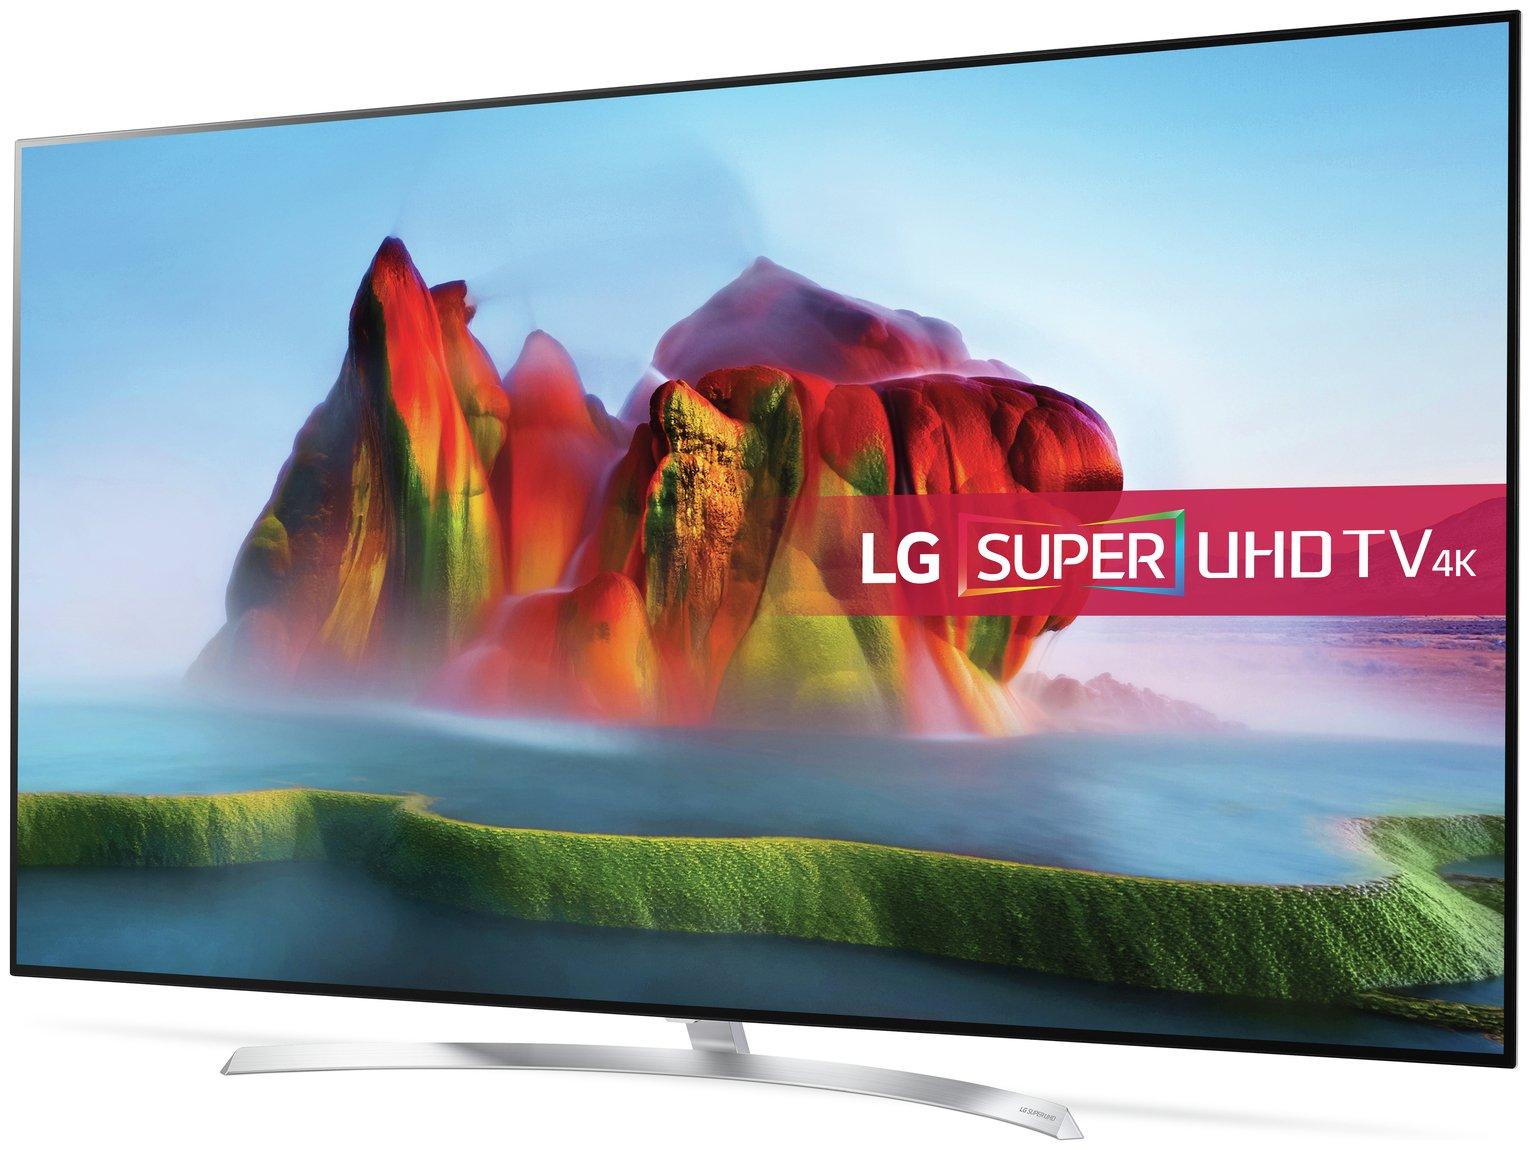 LG LG 55SJ850V 55 Inch Smart 4K Ultra HD TV with HDR - 20kg